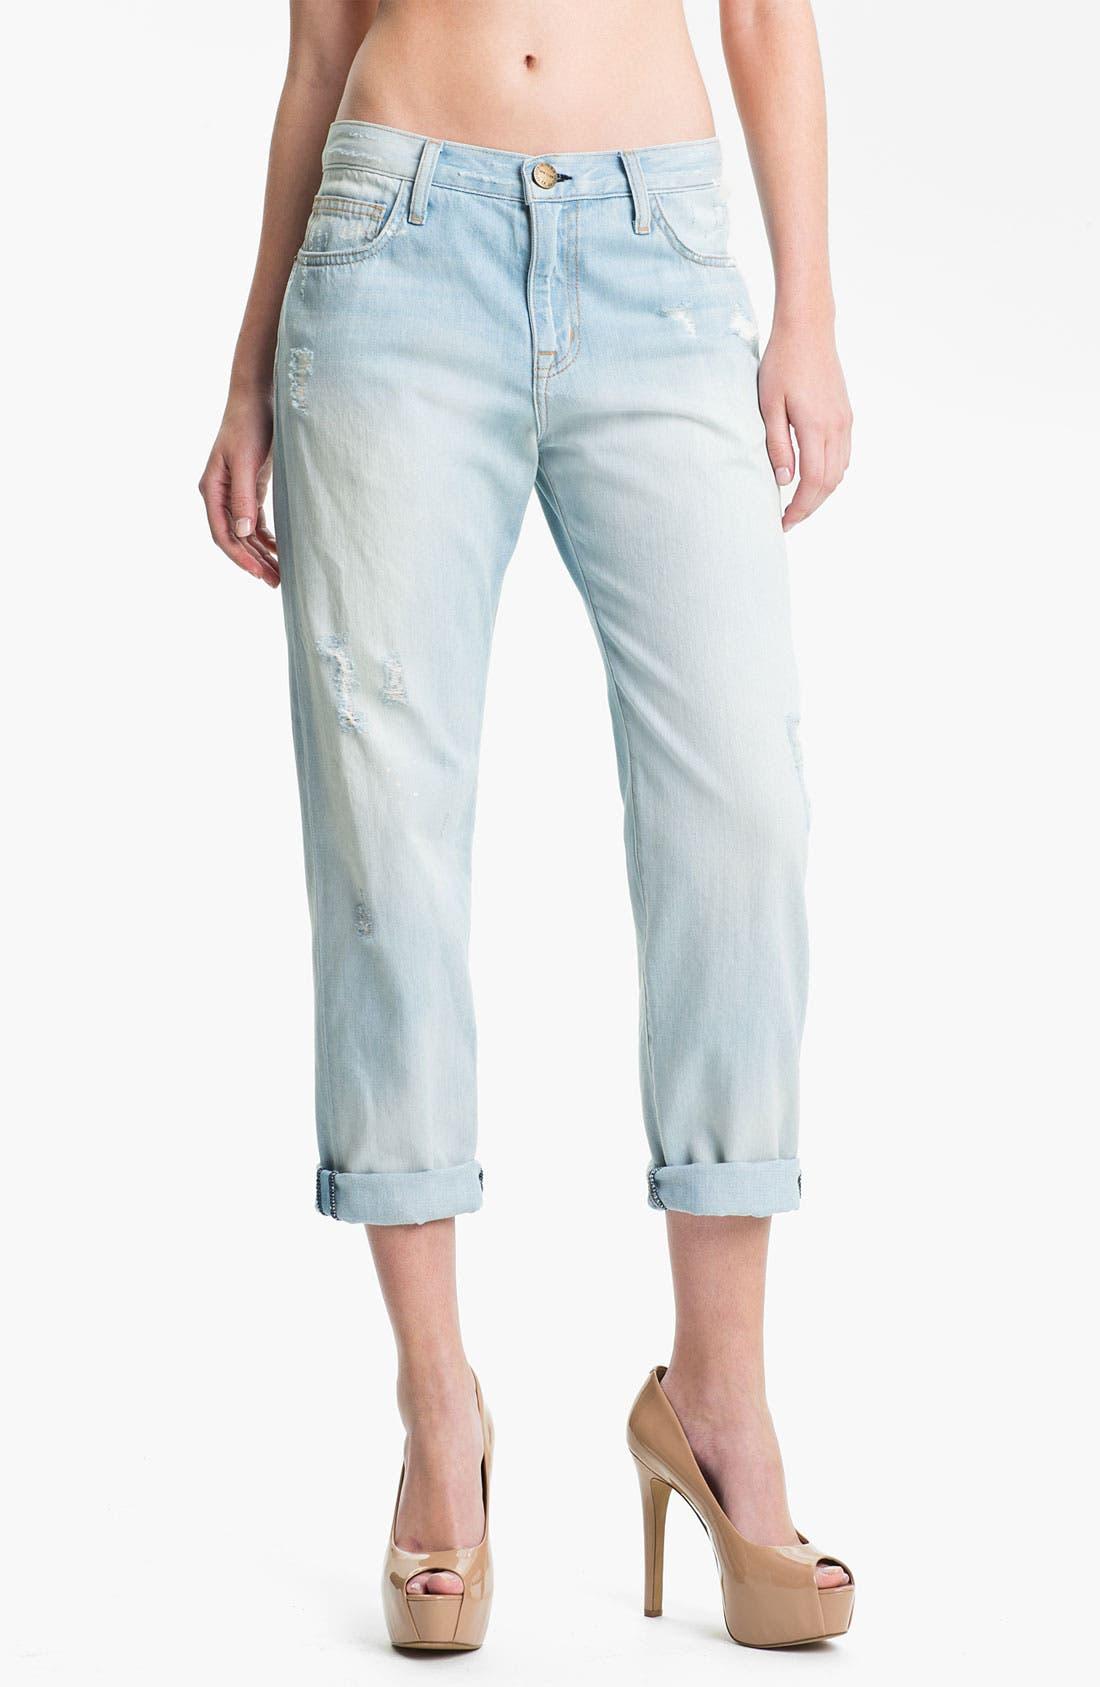 Alternate Image 1 Selected - Current/Elliott 'The Boyfriend' Distressed Jeans (Parlor/Destroy)